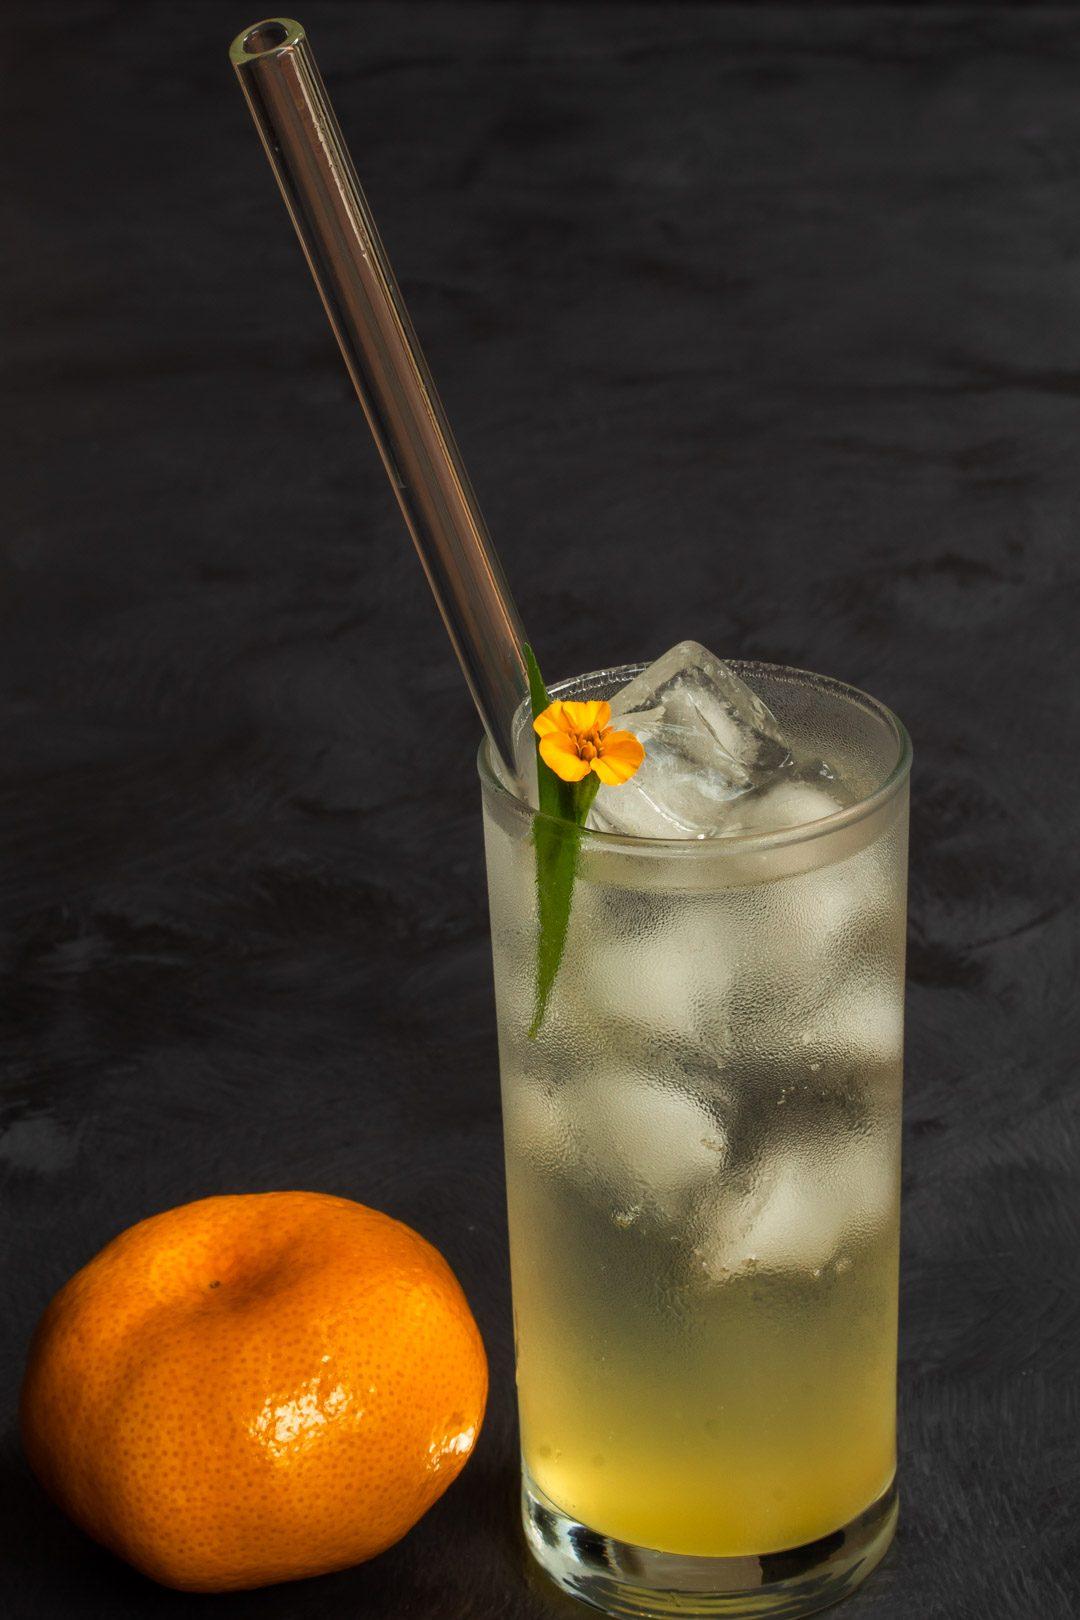 Mandarin tarragon shrub syrup drinking vinegar with mandarin in foreground from 45 degrees